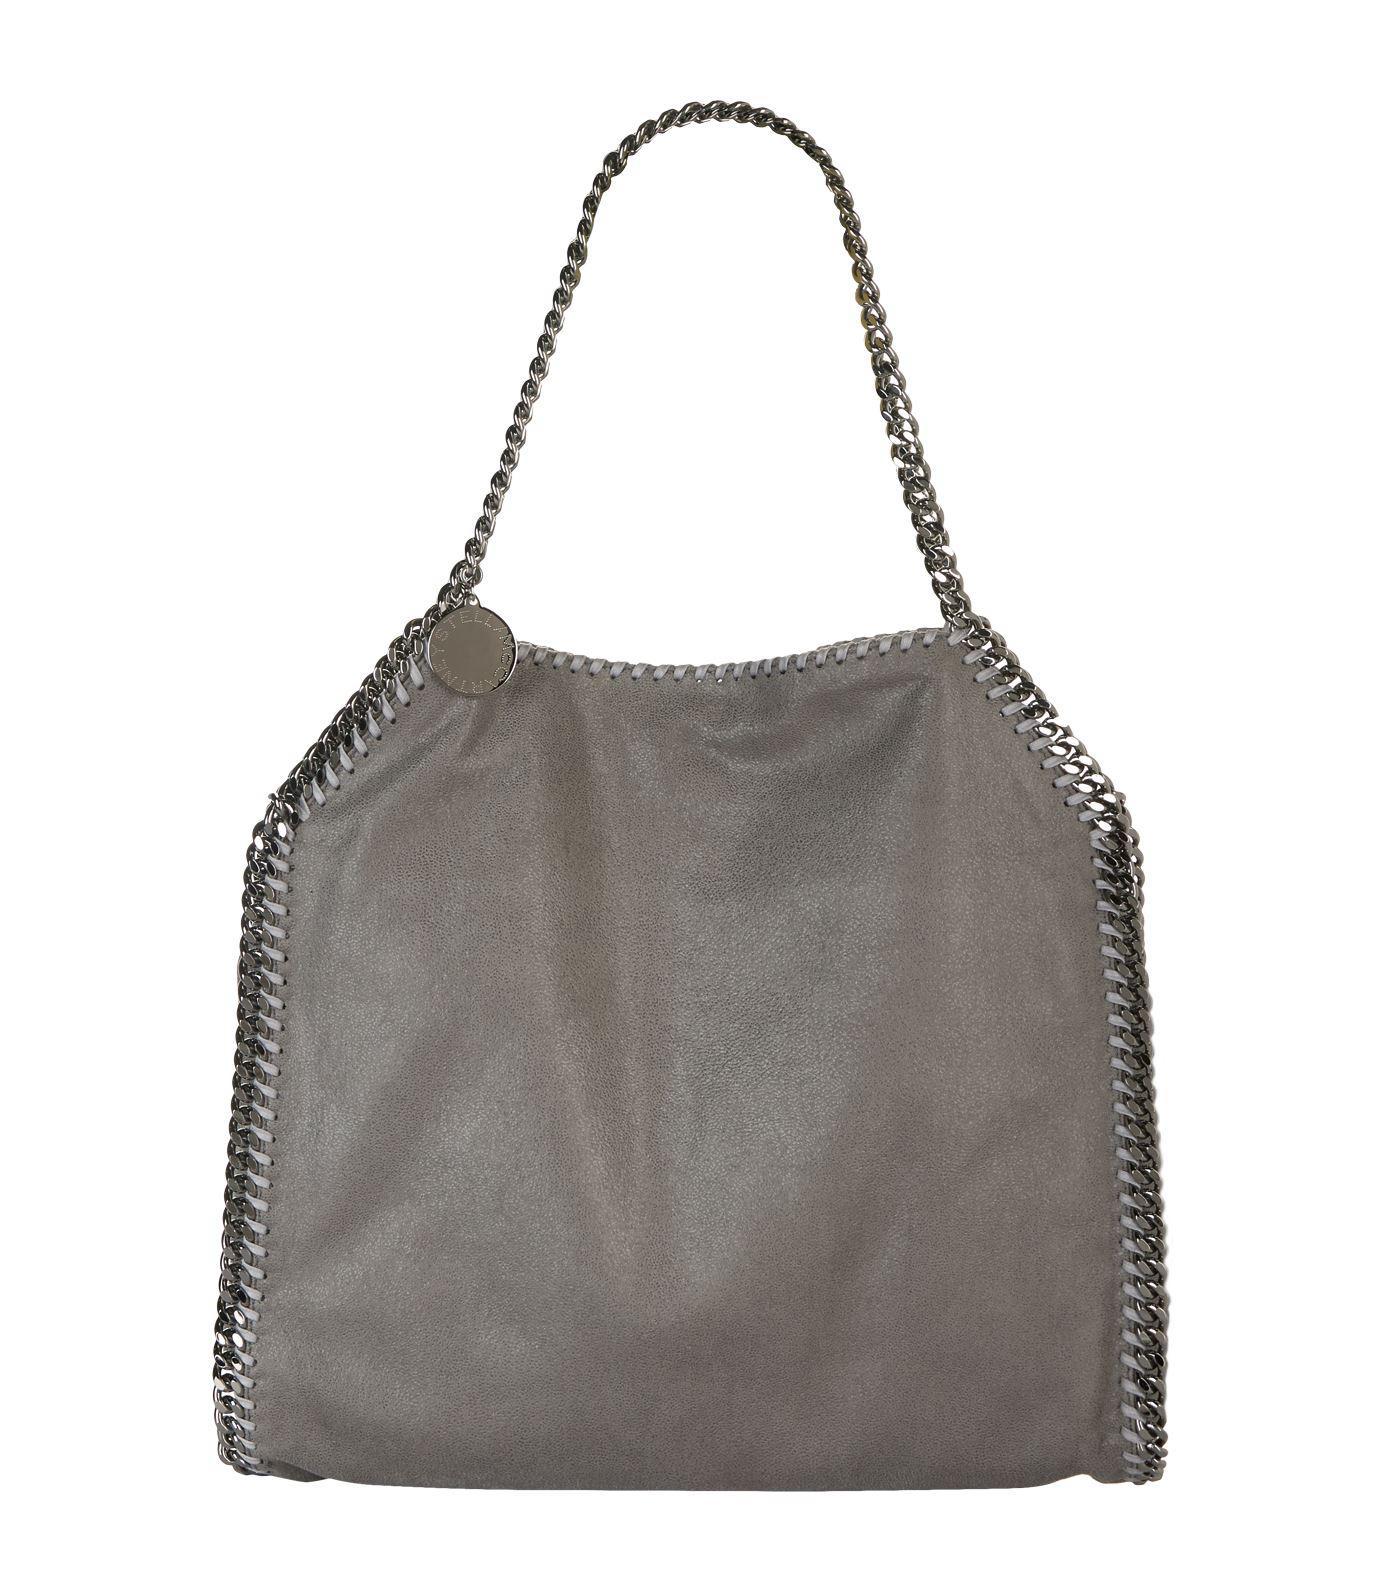 Stella McCartney Small Falabella Tote Bag in Grey (Grey)